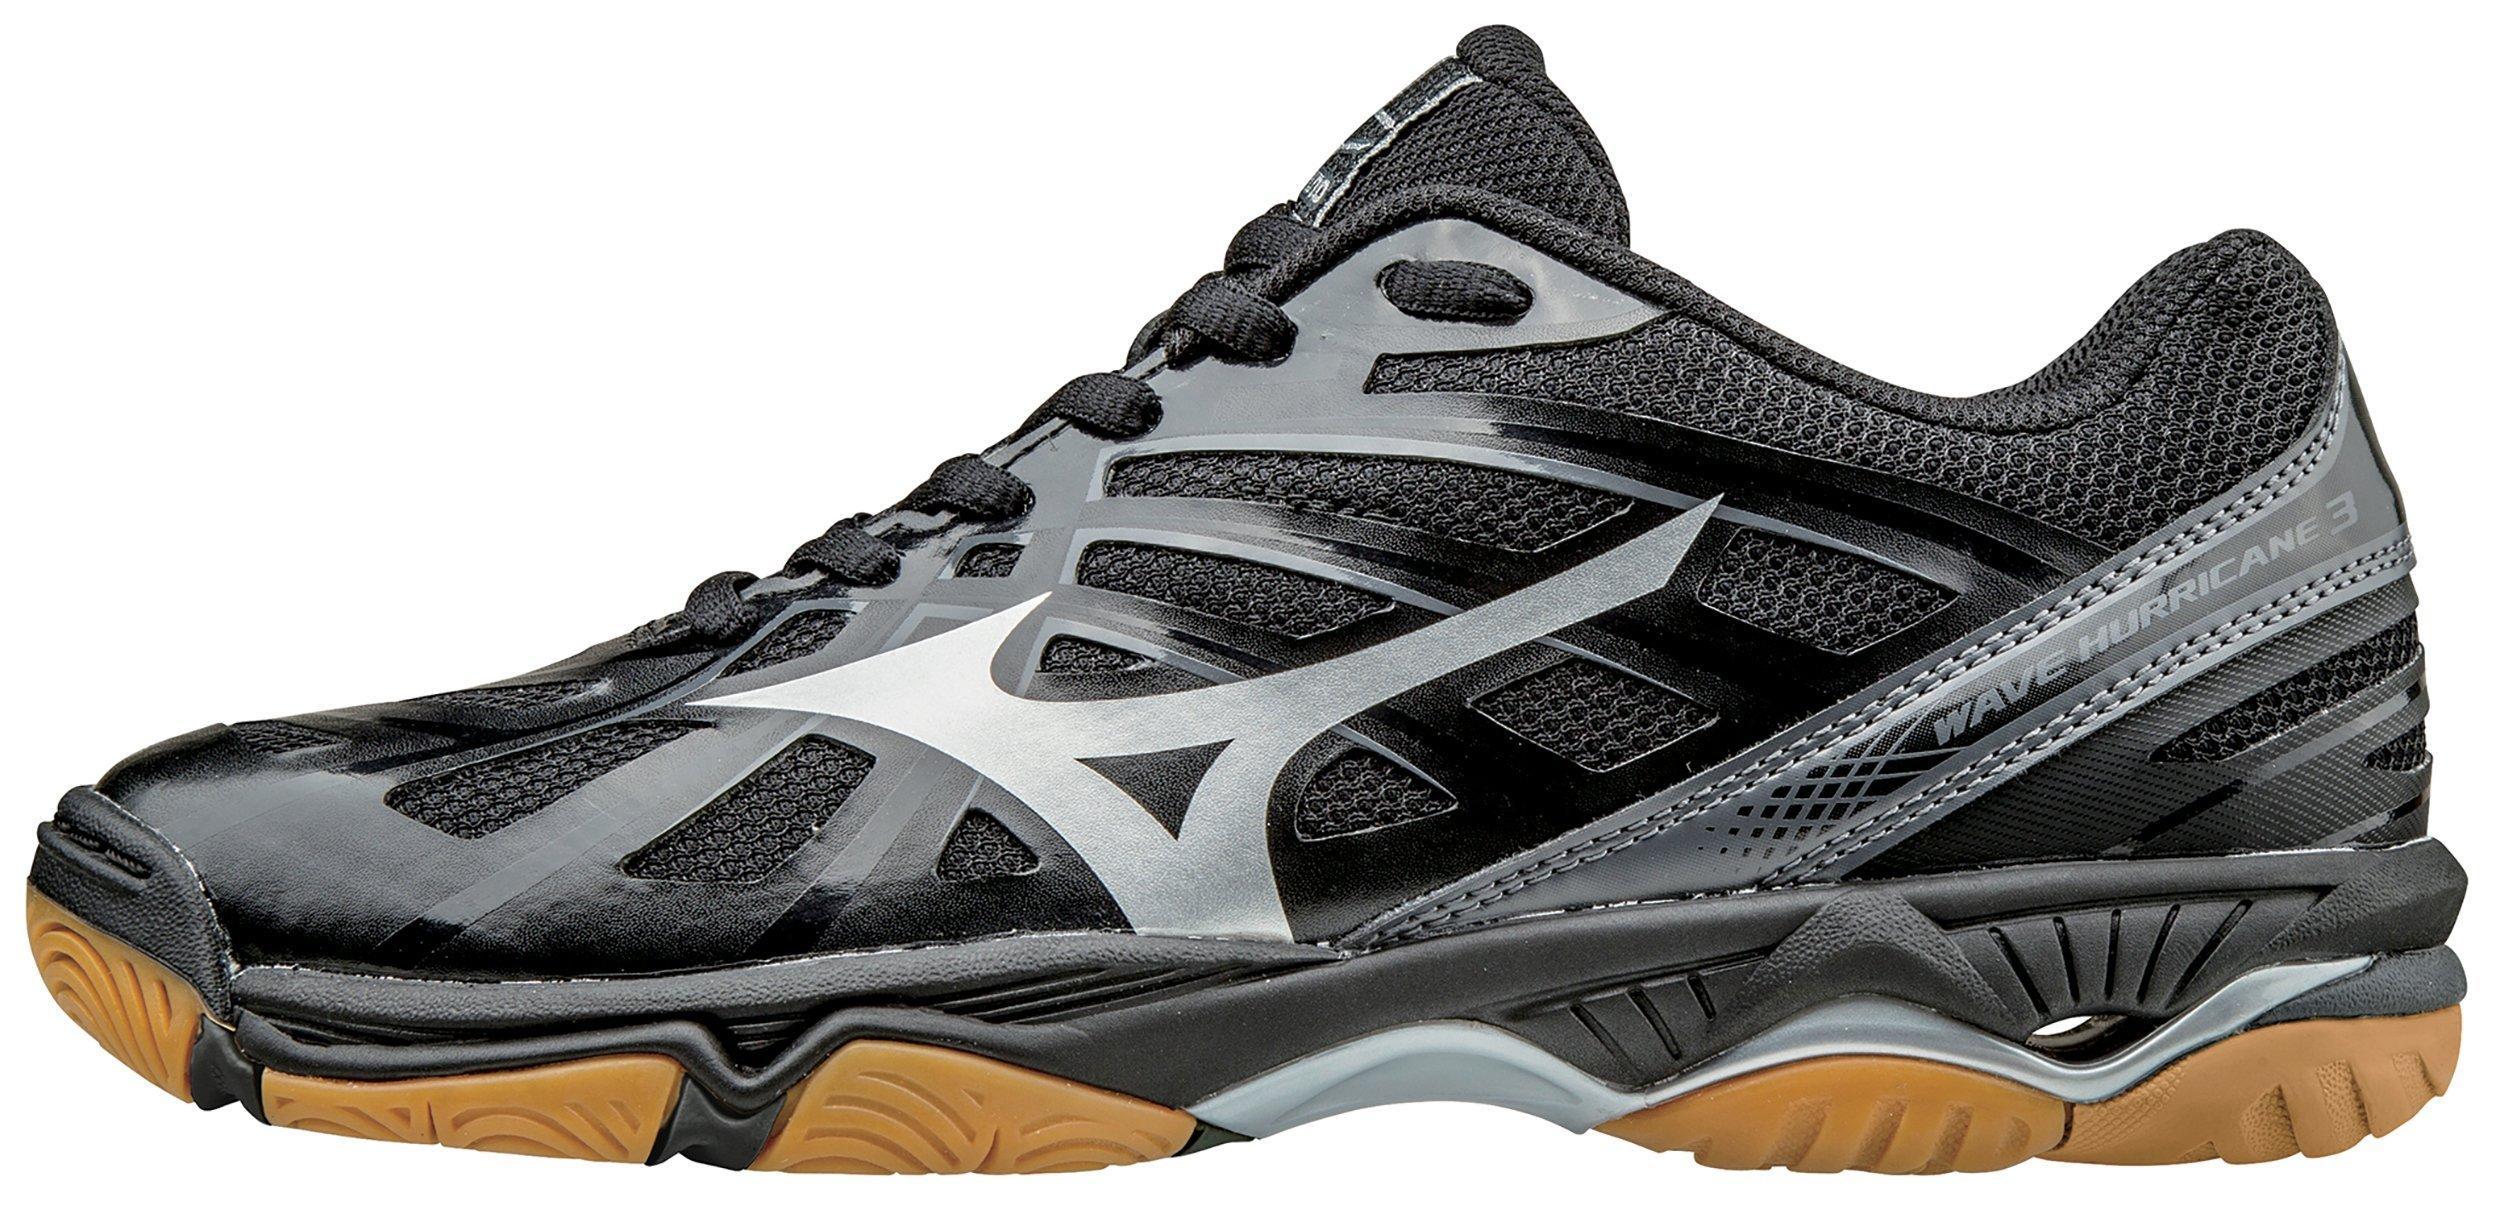 Mizuno Chaussures De Volley-ball 7.5 LlB1f56a